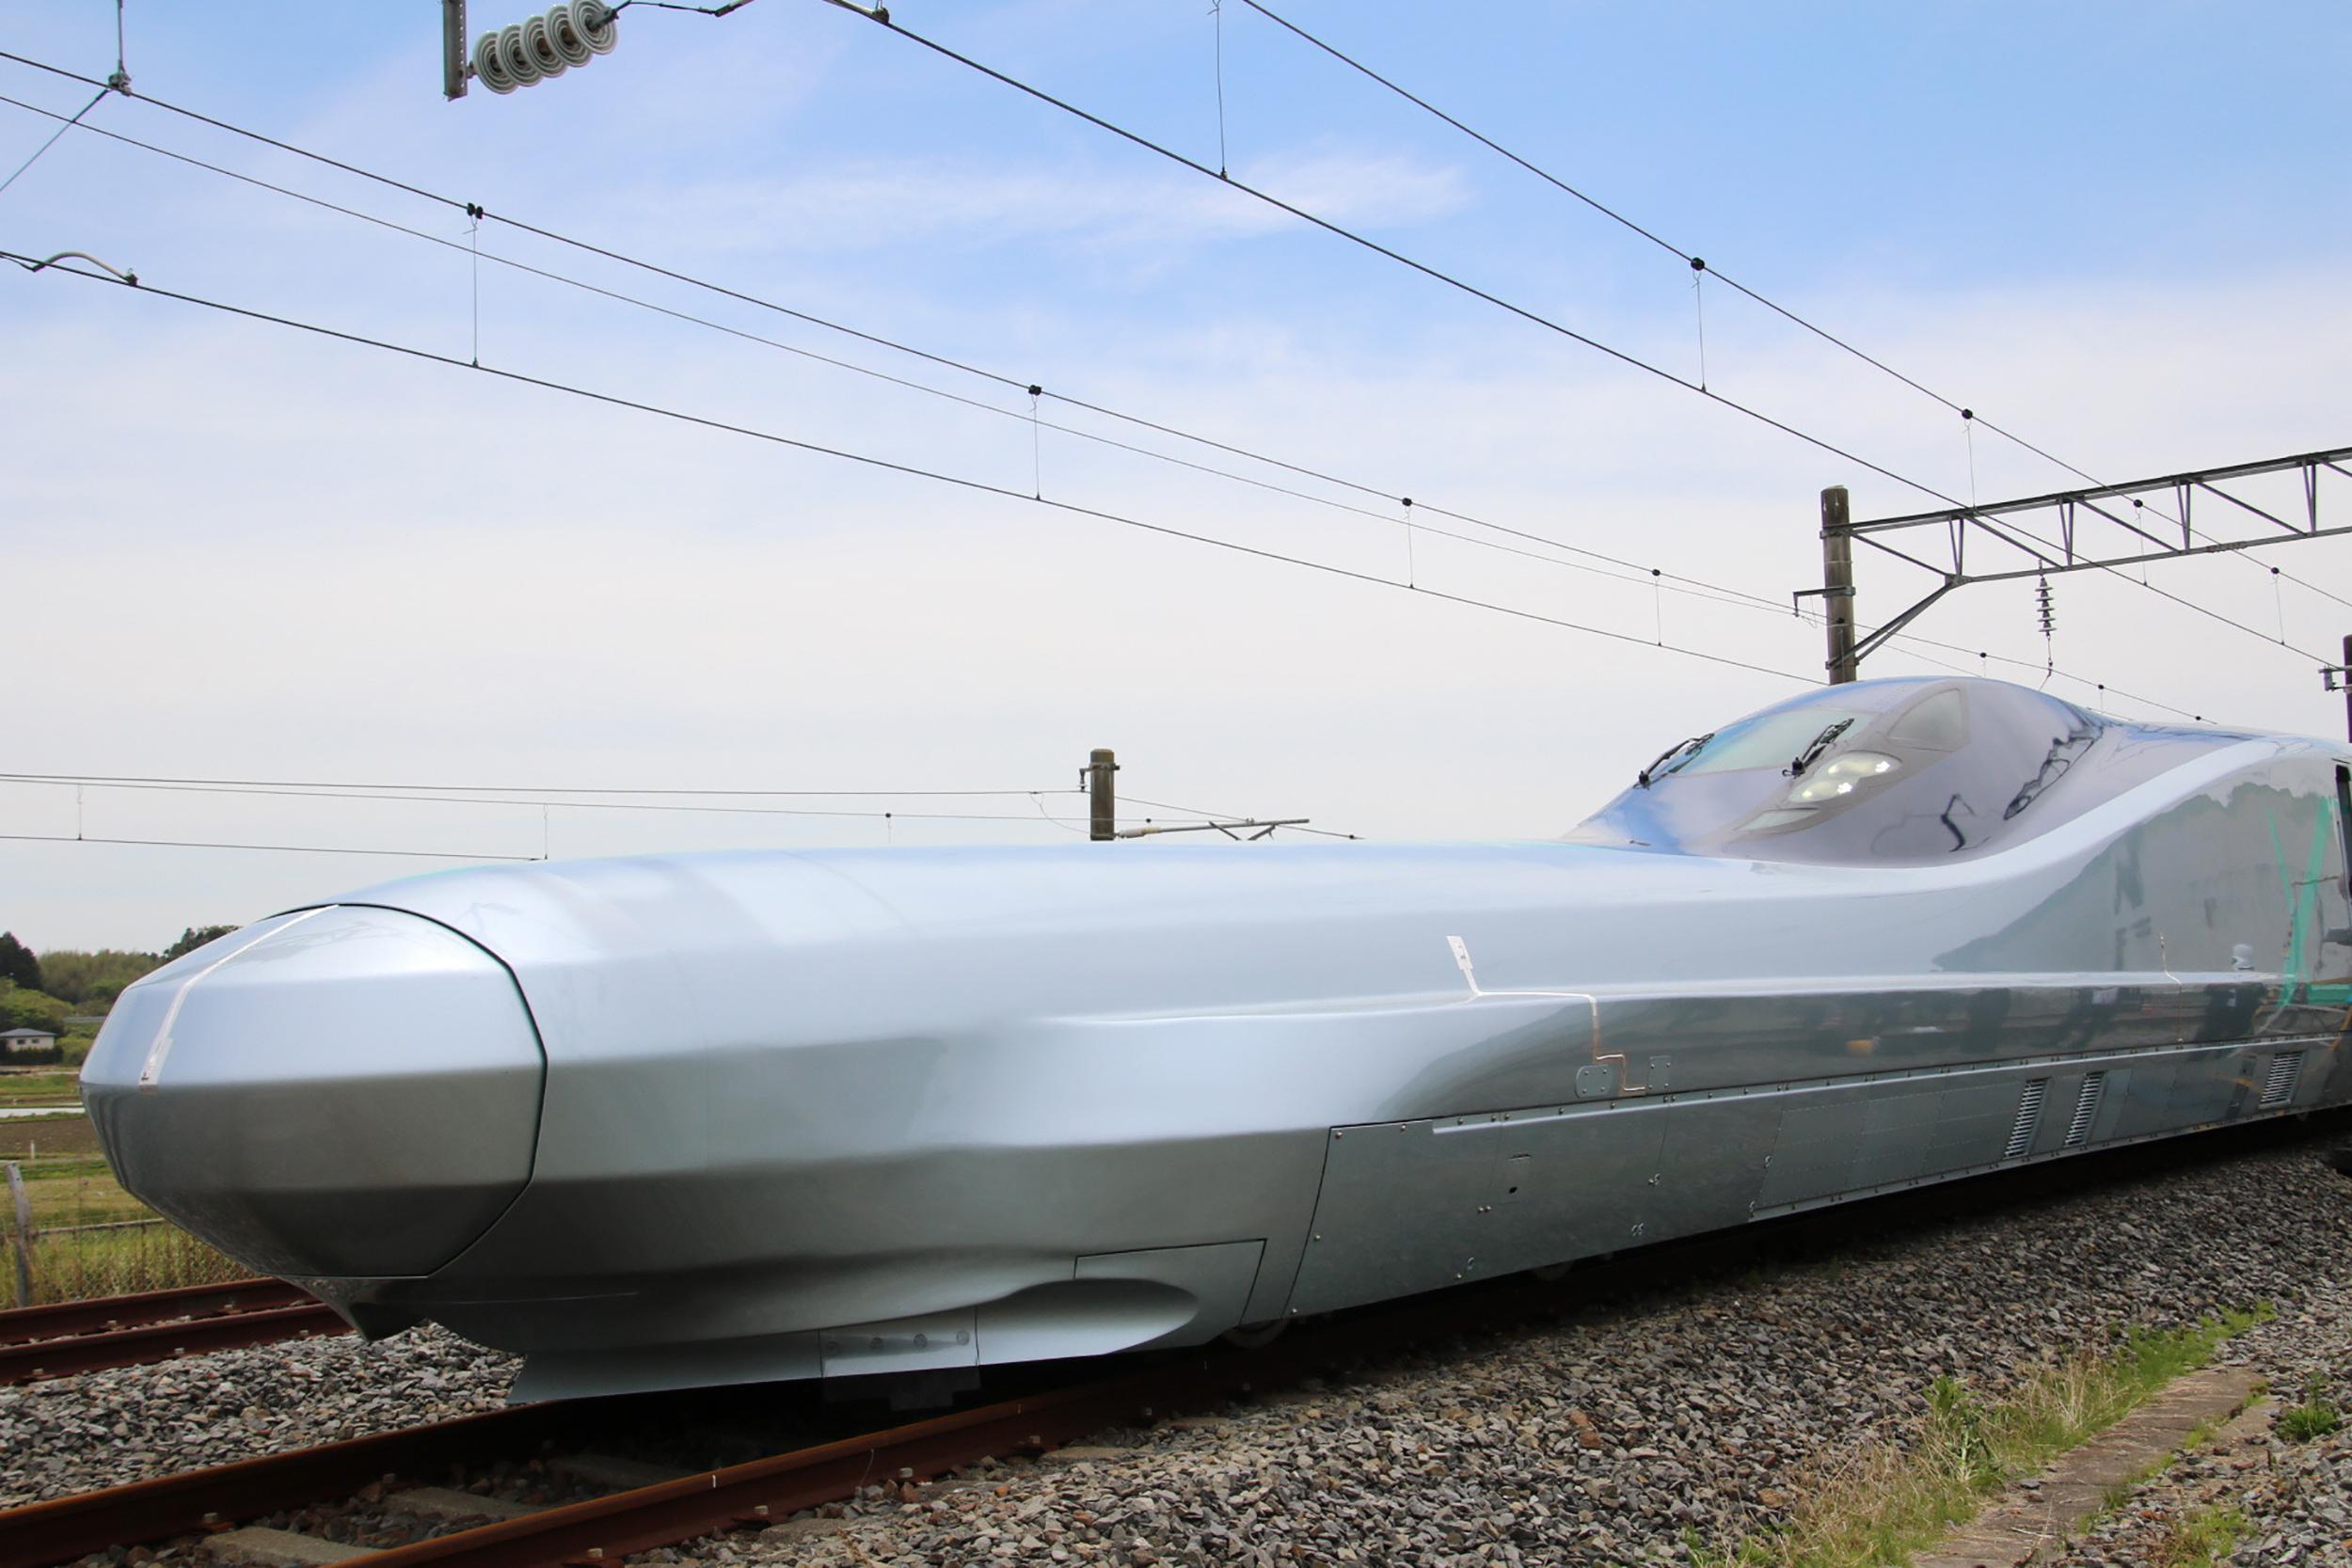 Japanese Railway Company Starts Testing 249mph Bullet